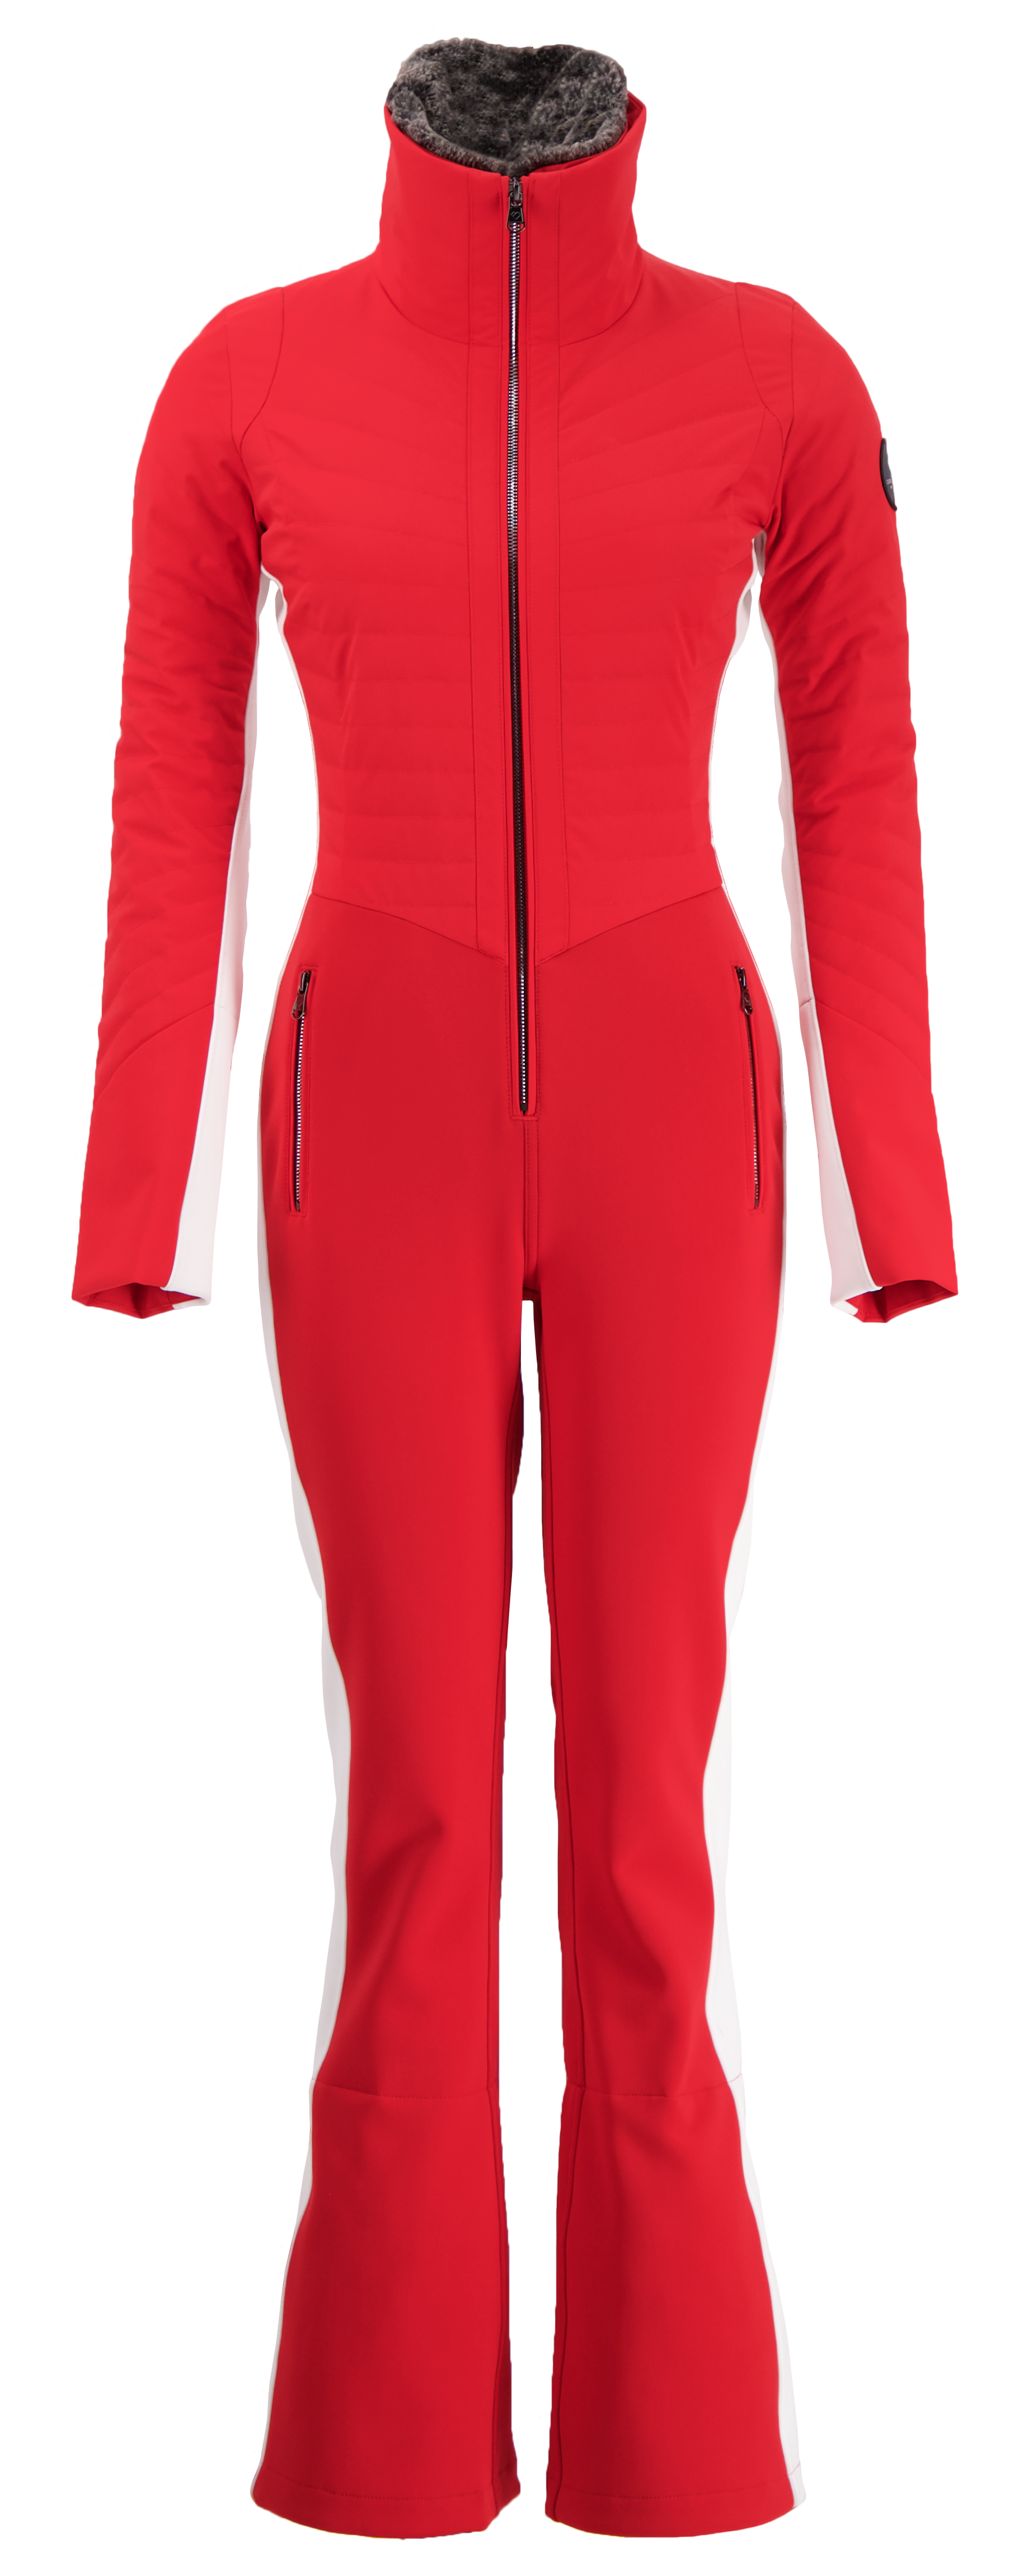 après-ski clothes.1